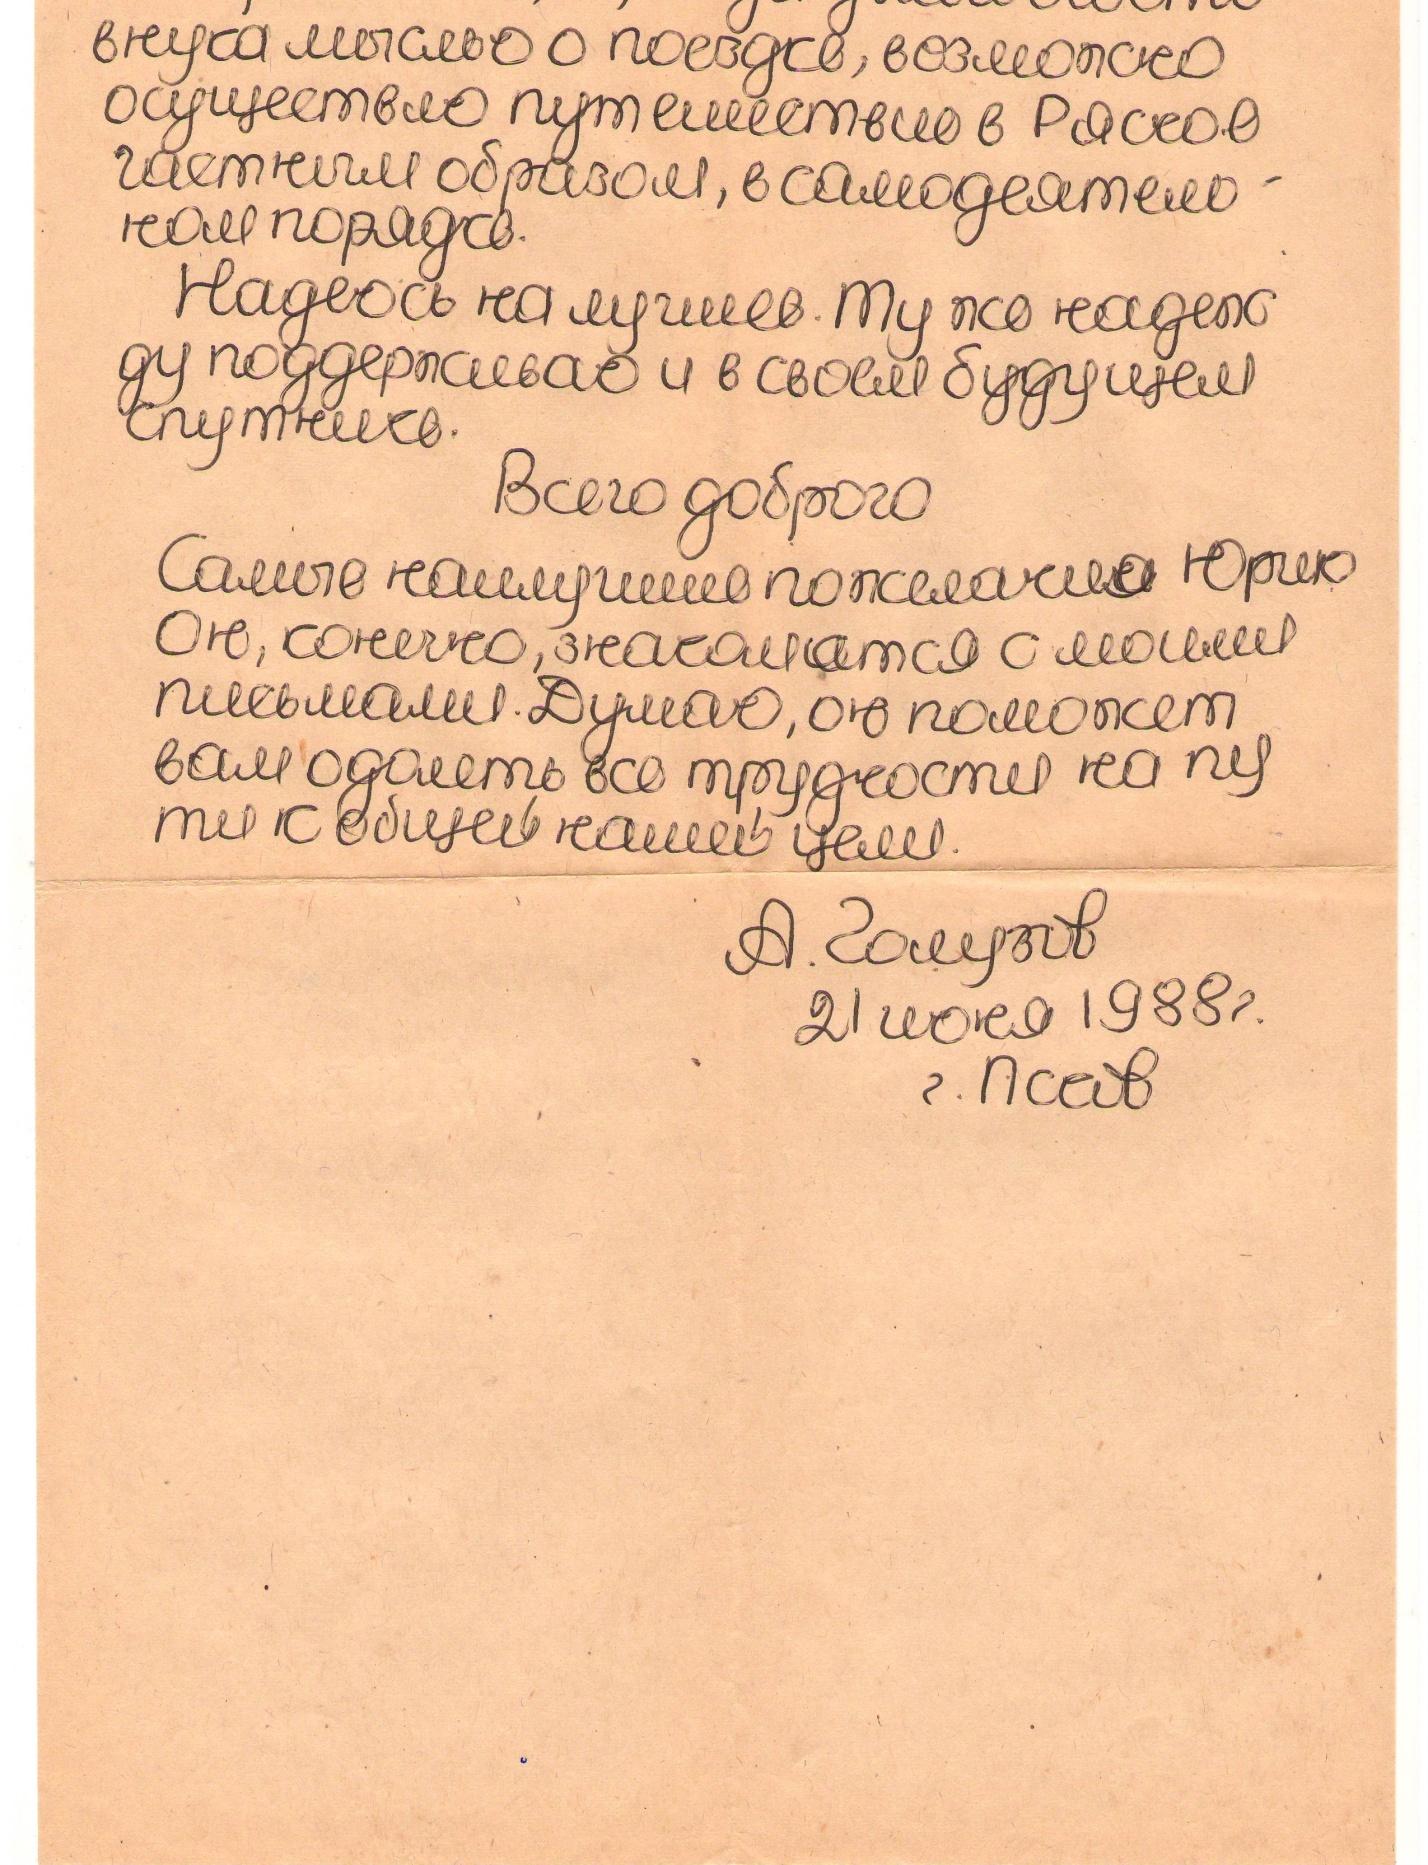 C:\Documents and Settings\СоцПед\Рабочий стол\2013-11-18\21.06.1988\Изображение0007.JPG